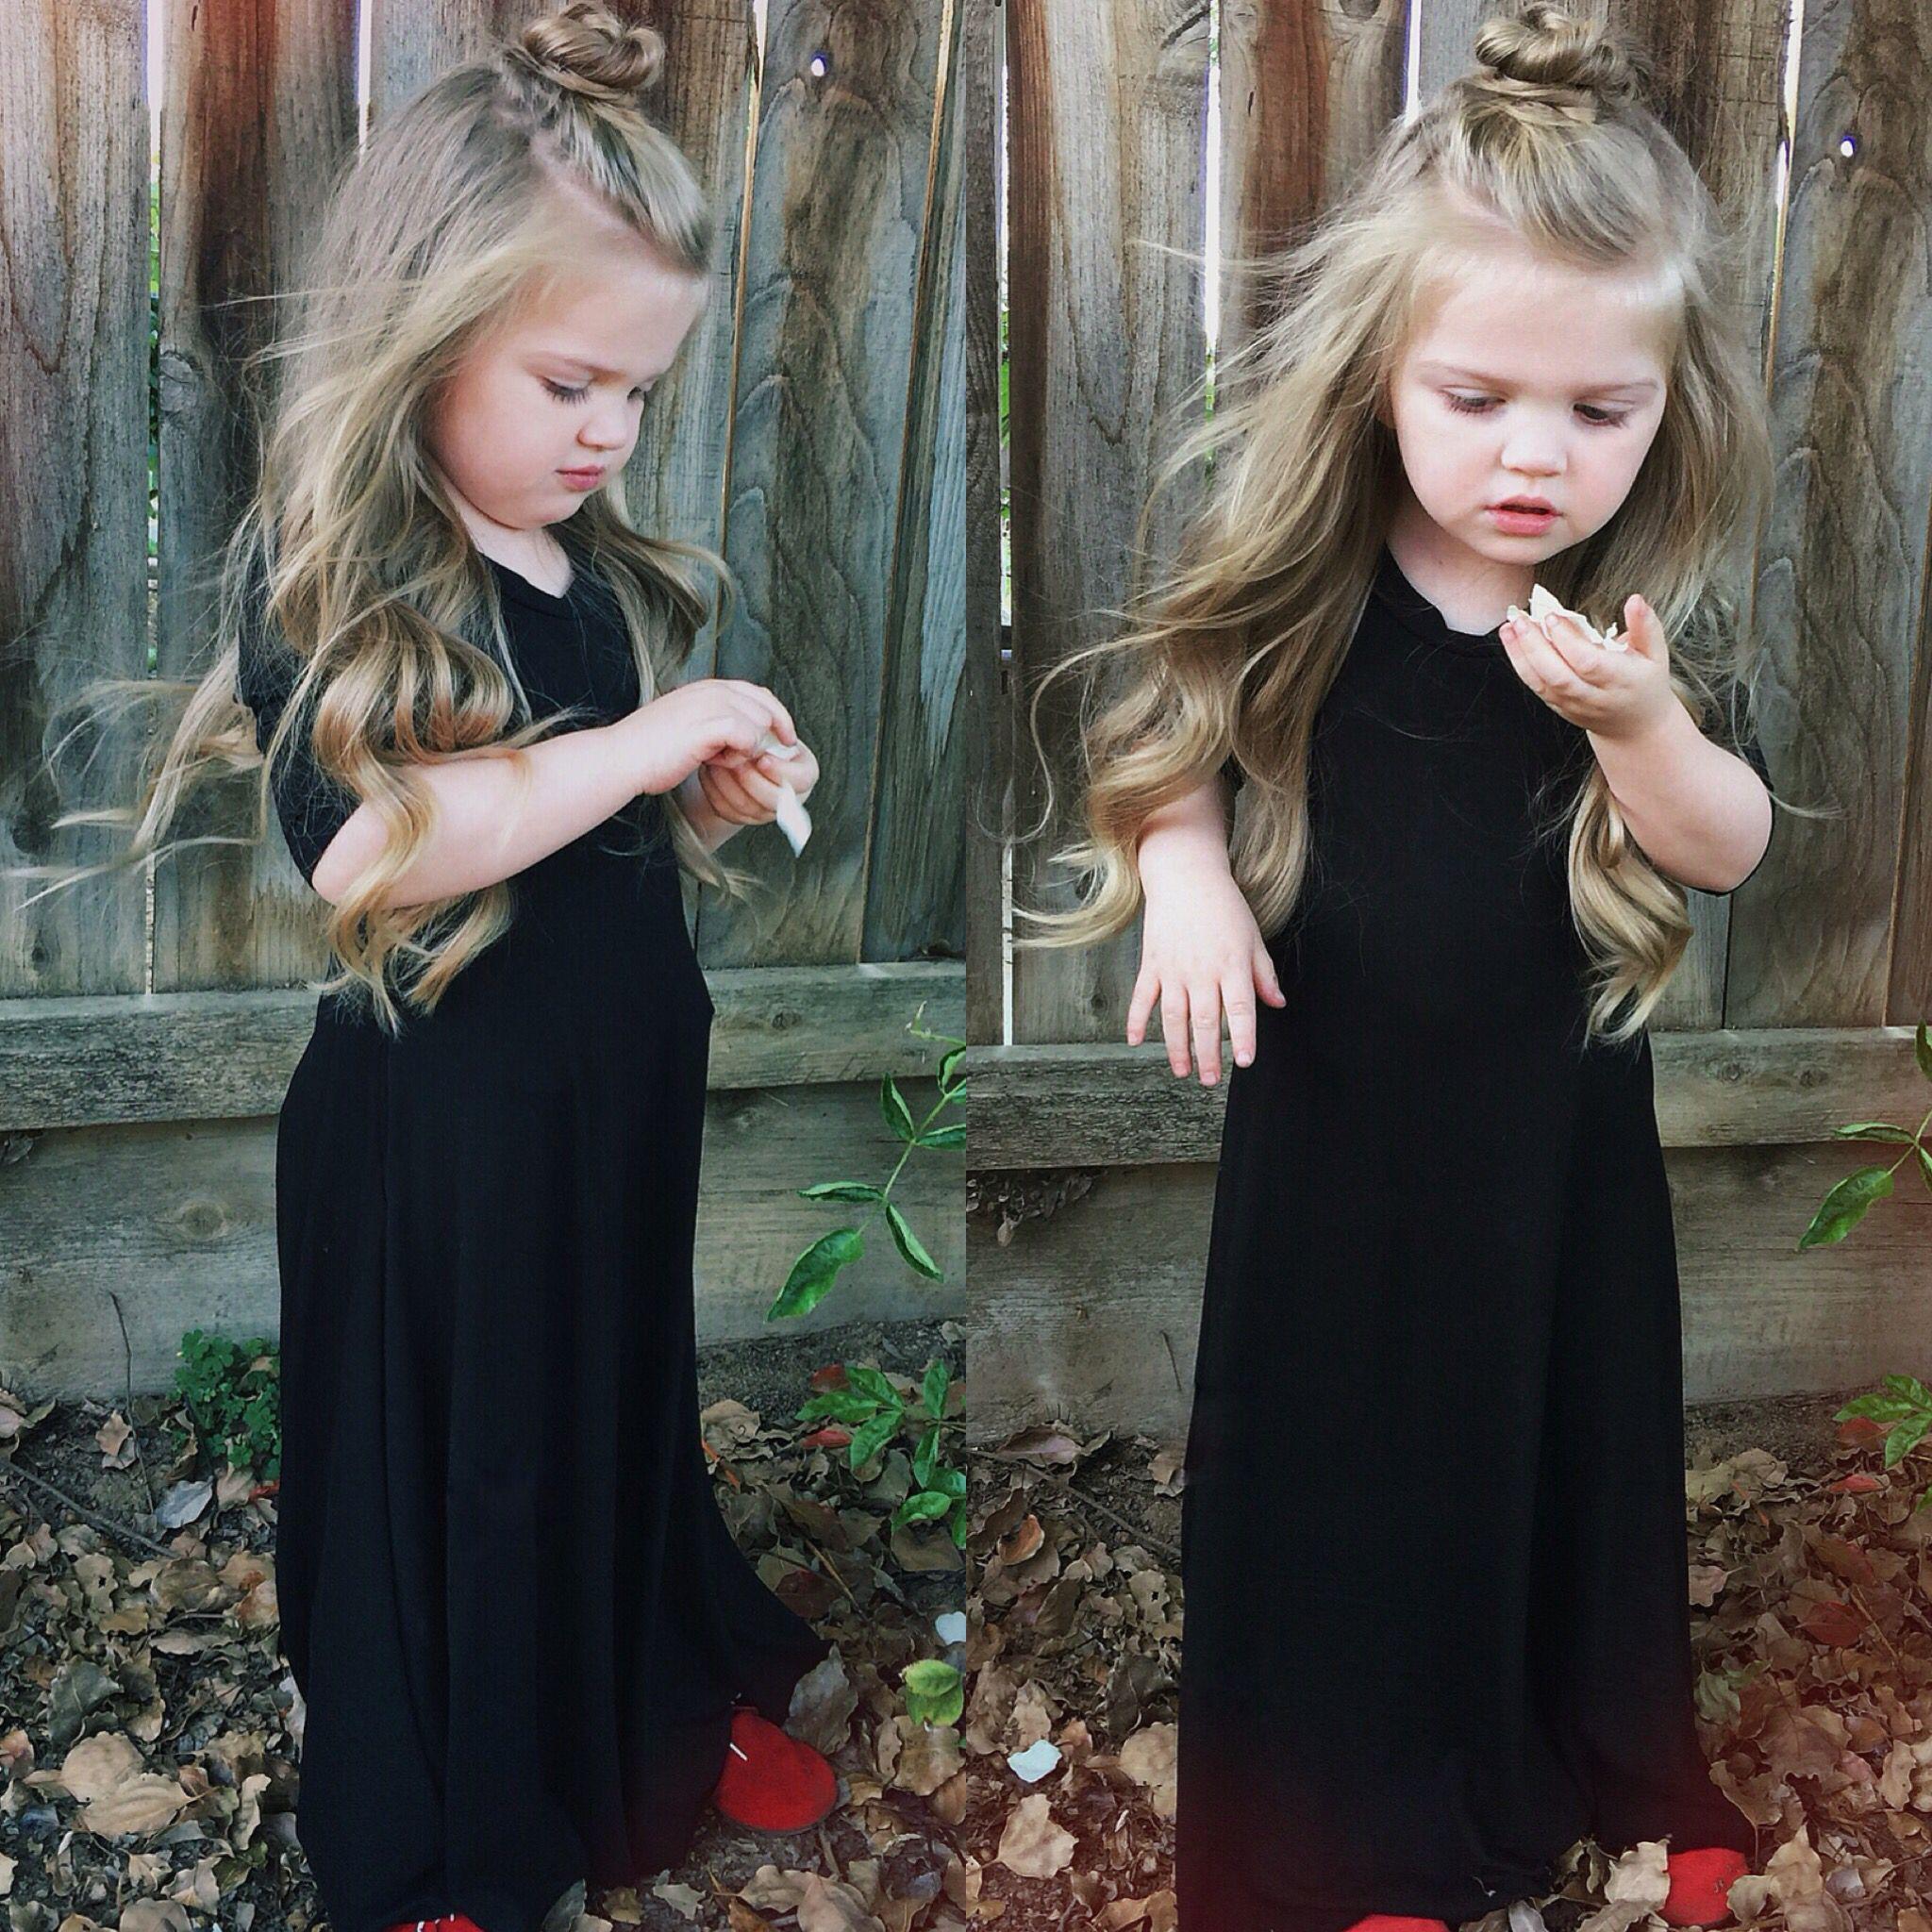 littlegirl tied up Top knot half up half down Little girl hair